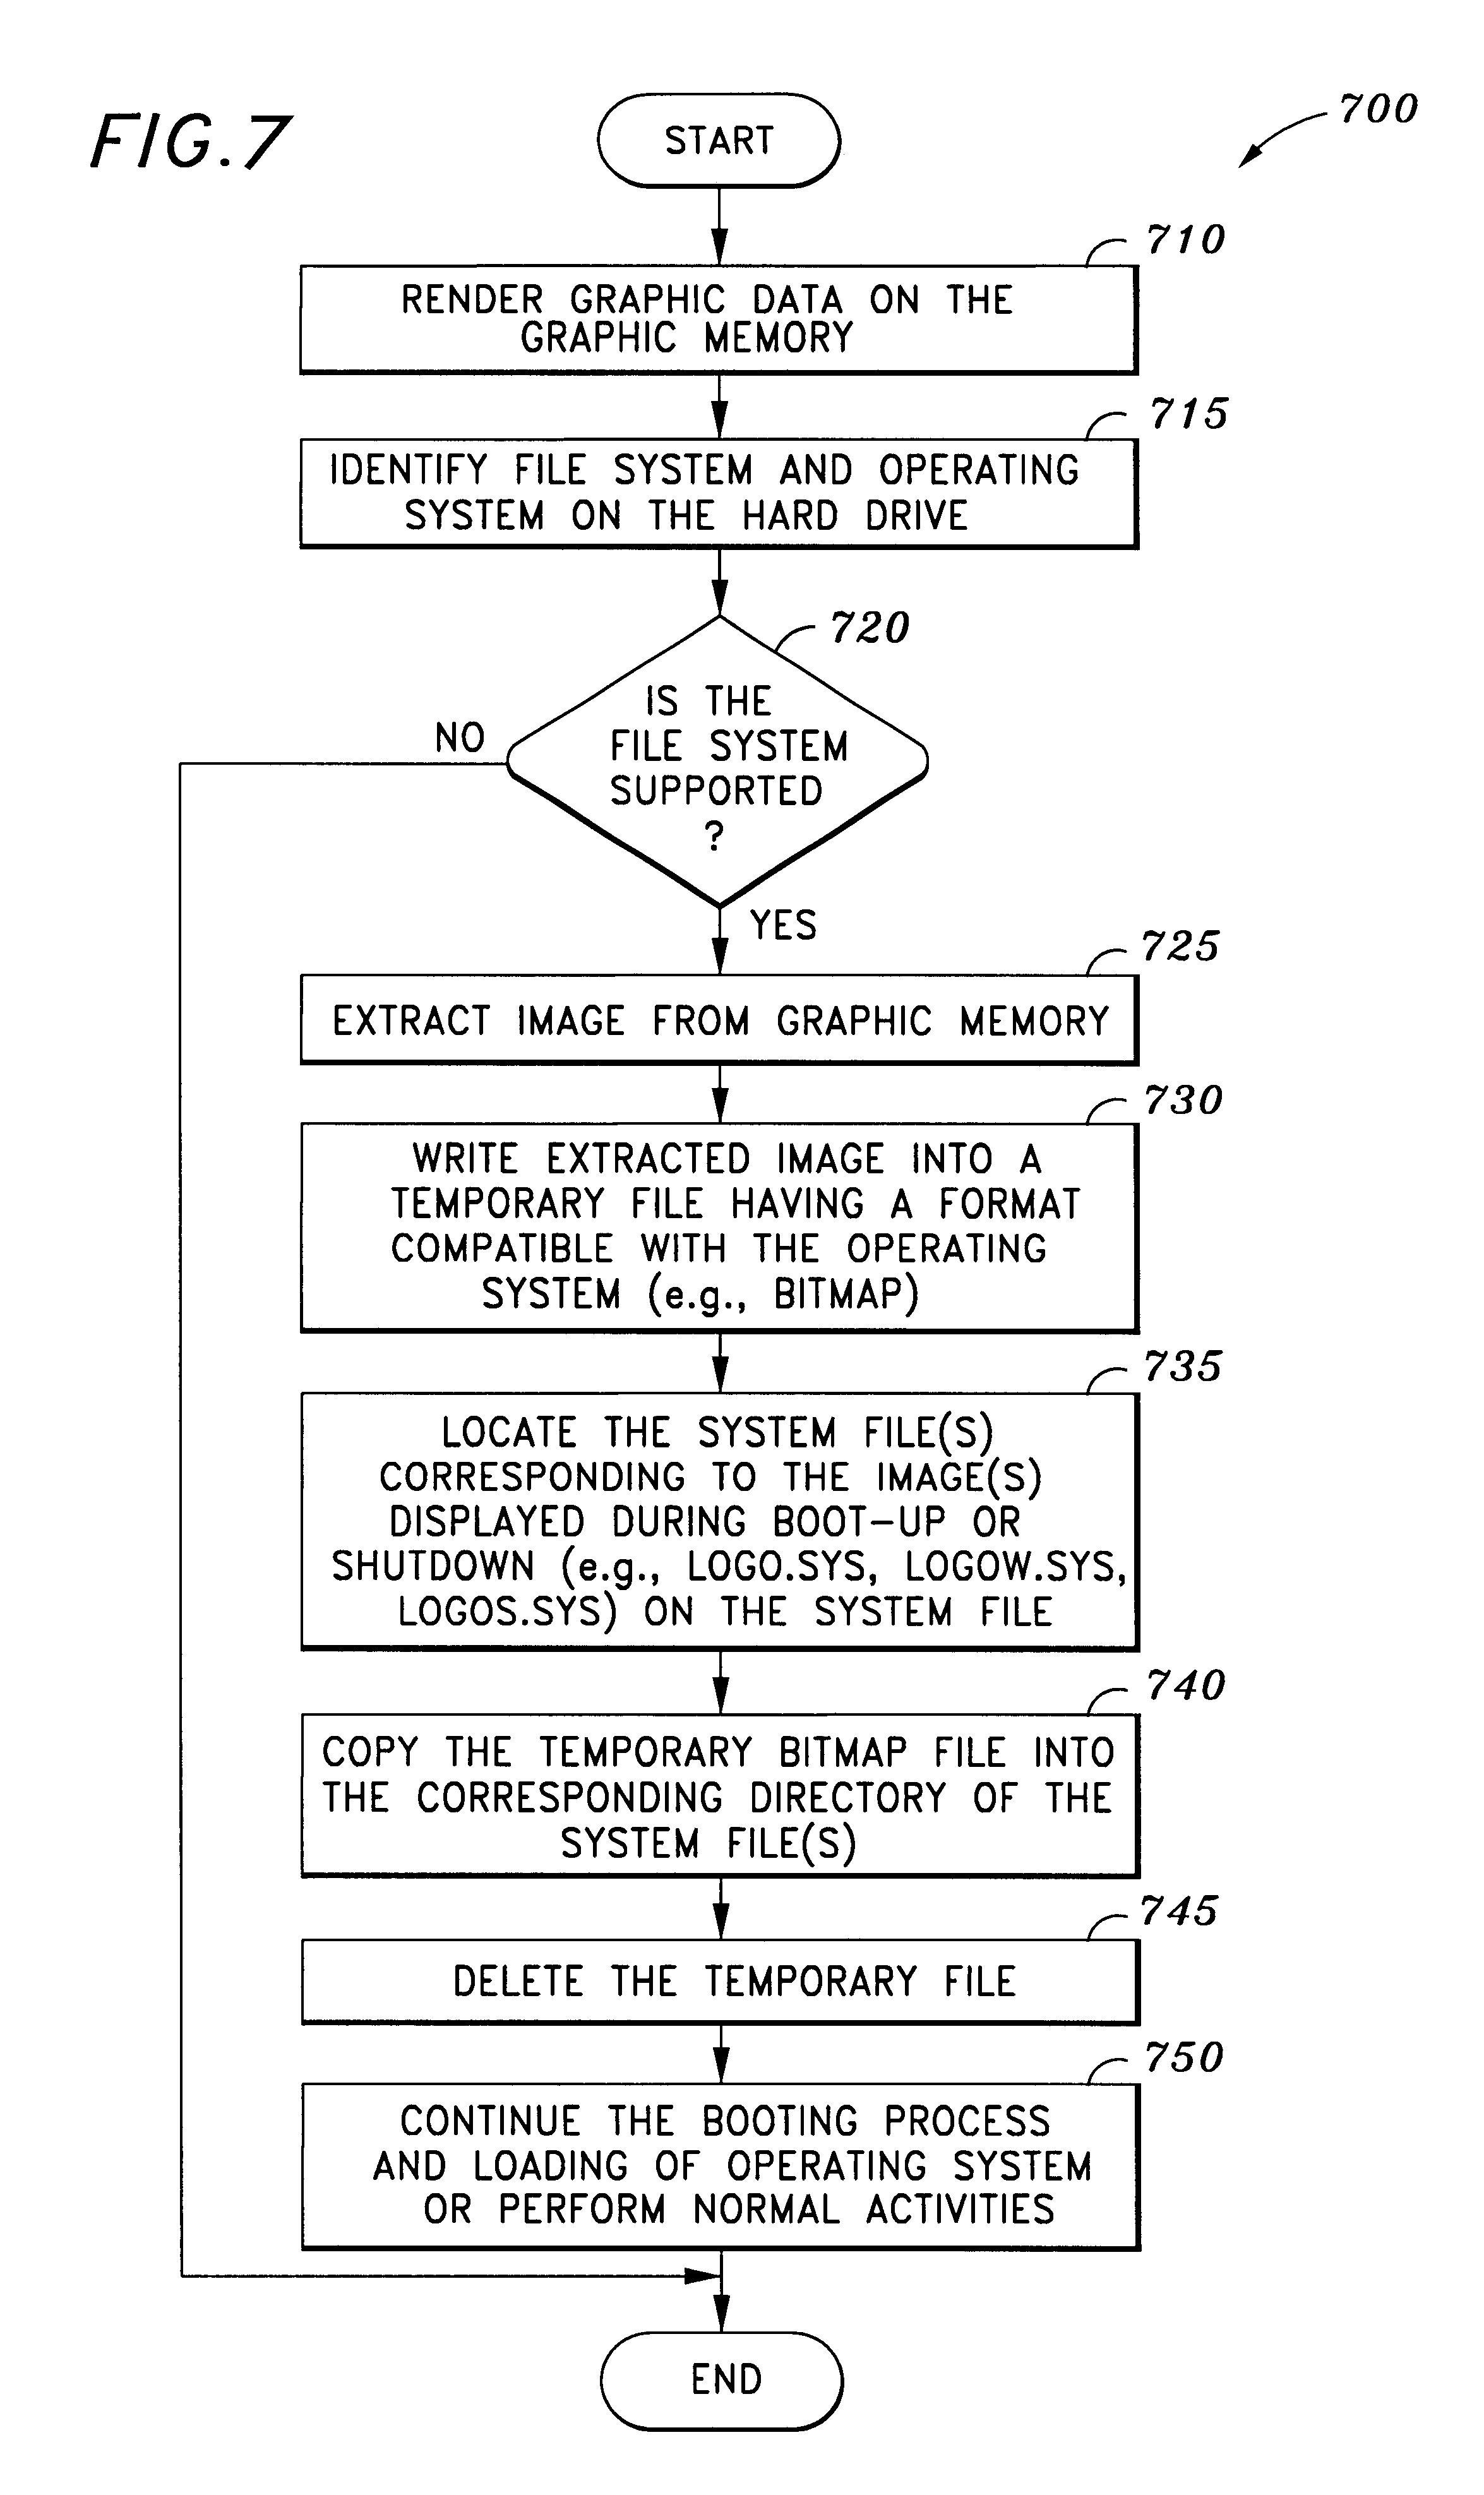 Patent US 6,373,498 B1